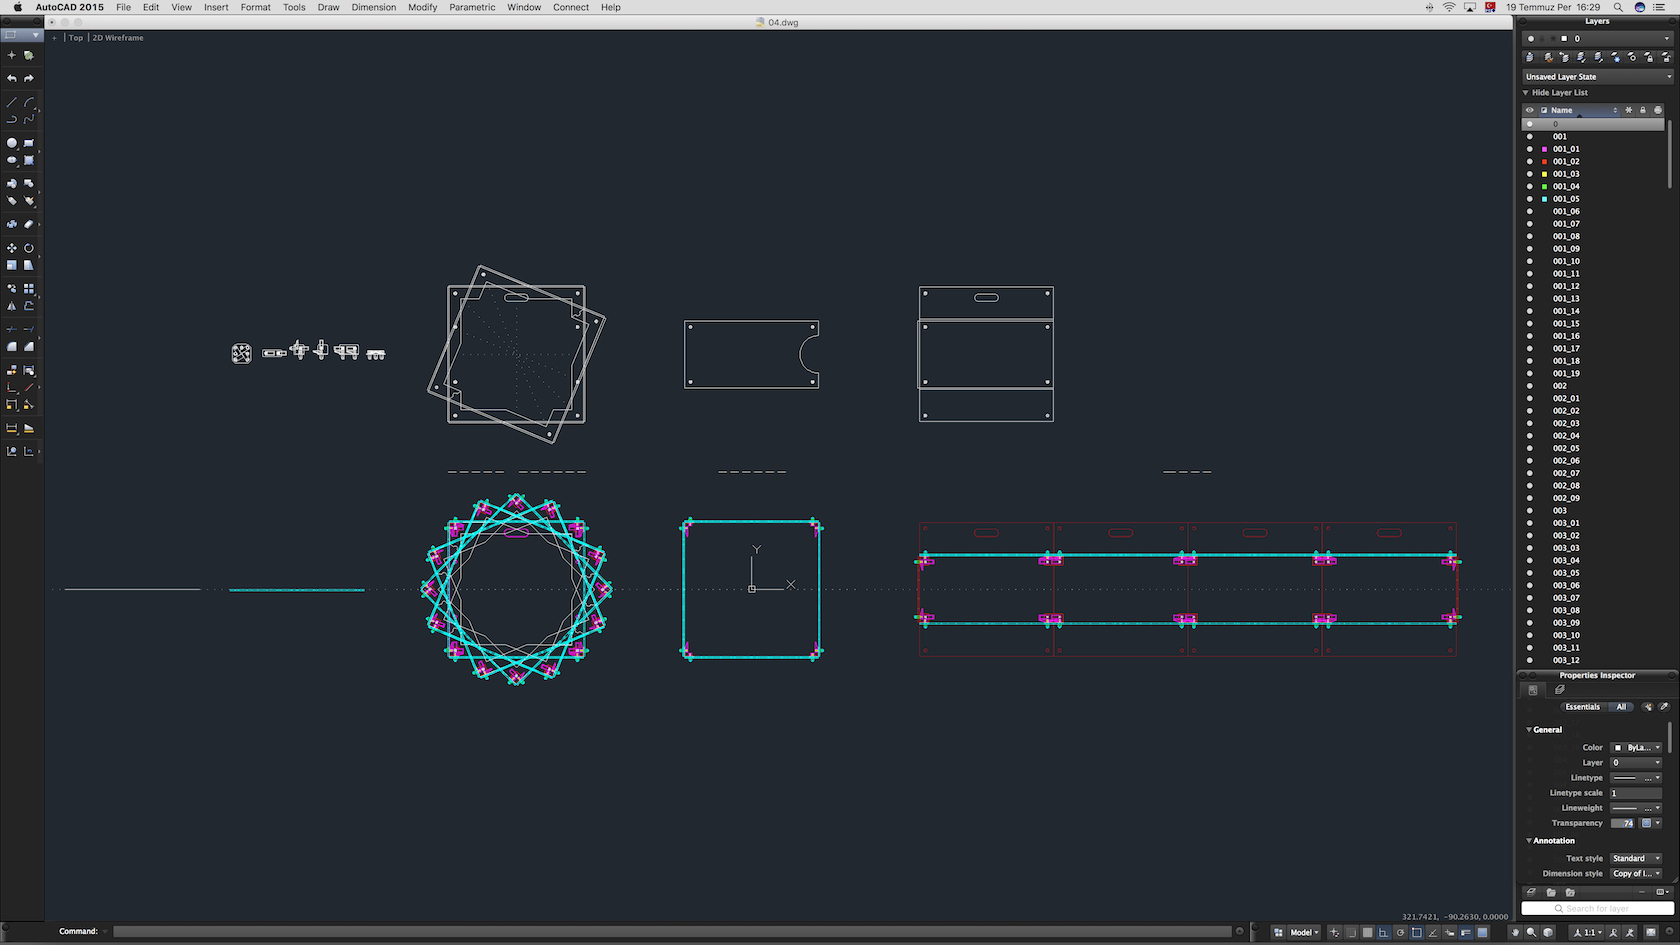 70-Cad-04-02-1680.jpg Download STL file Stage Decor Collection 01 (Modular 9 Pieces) • 3D printer model, akerStudio